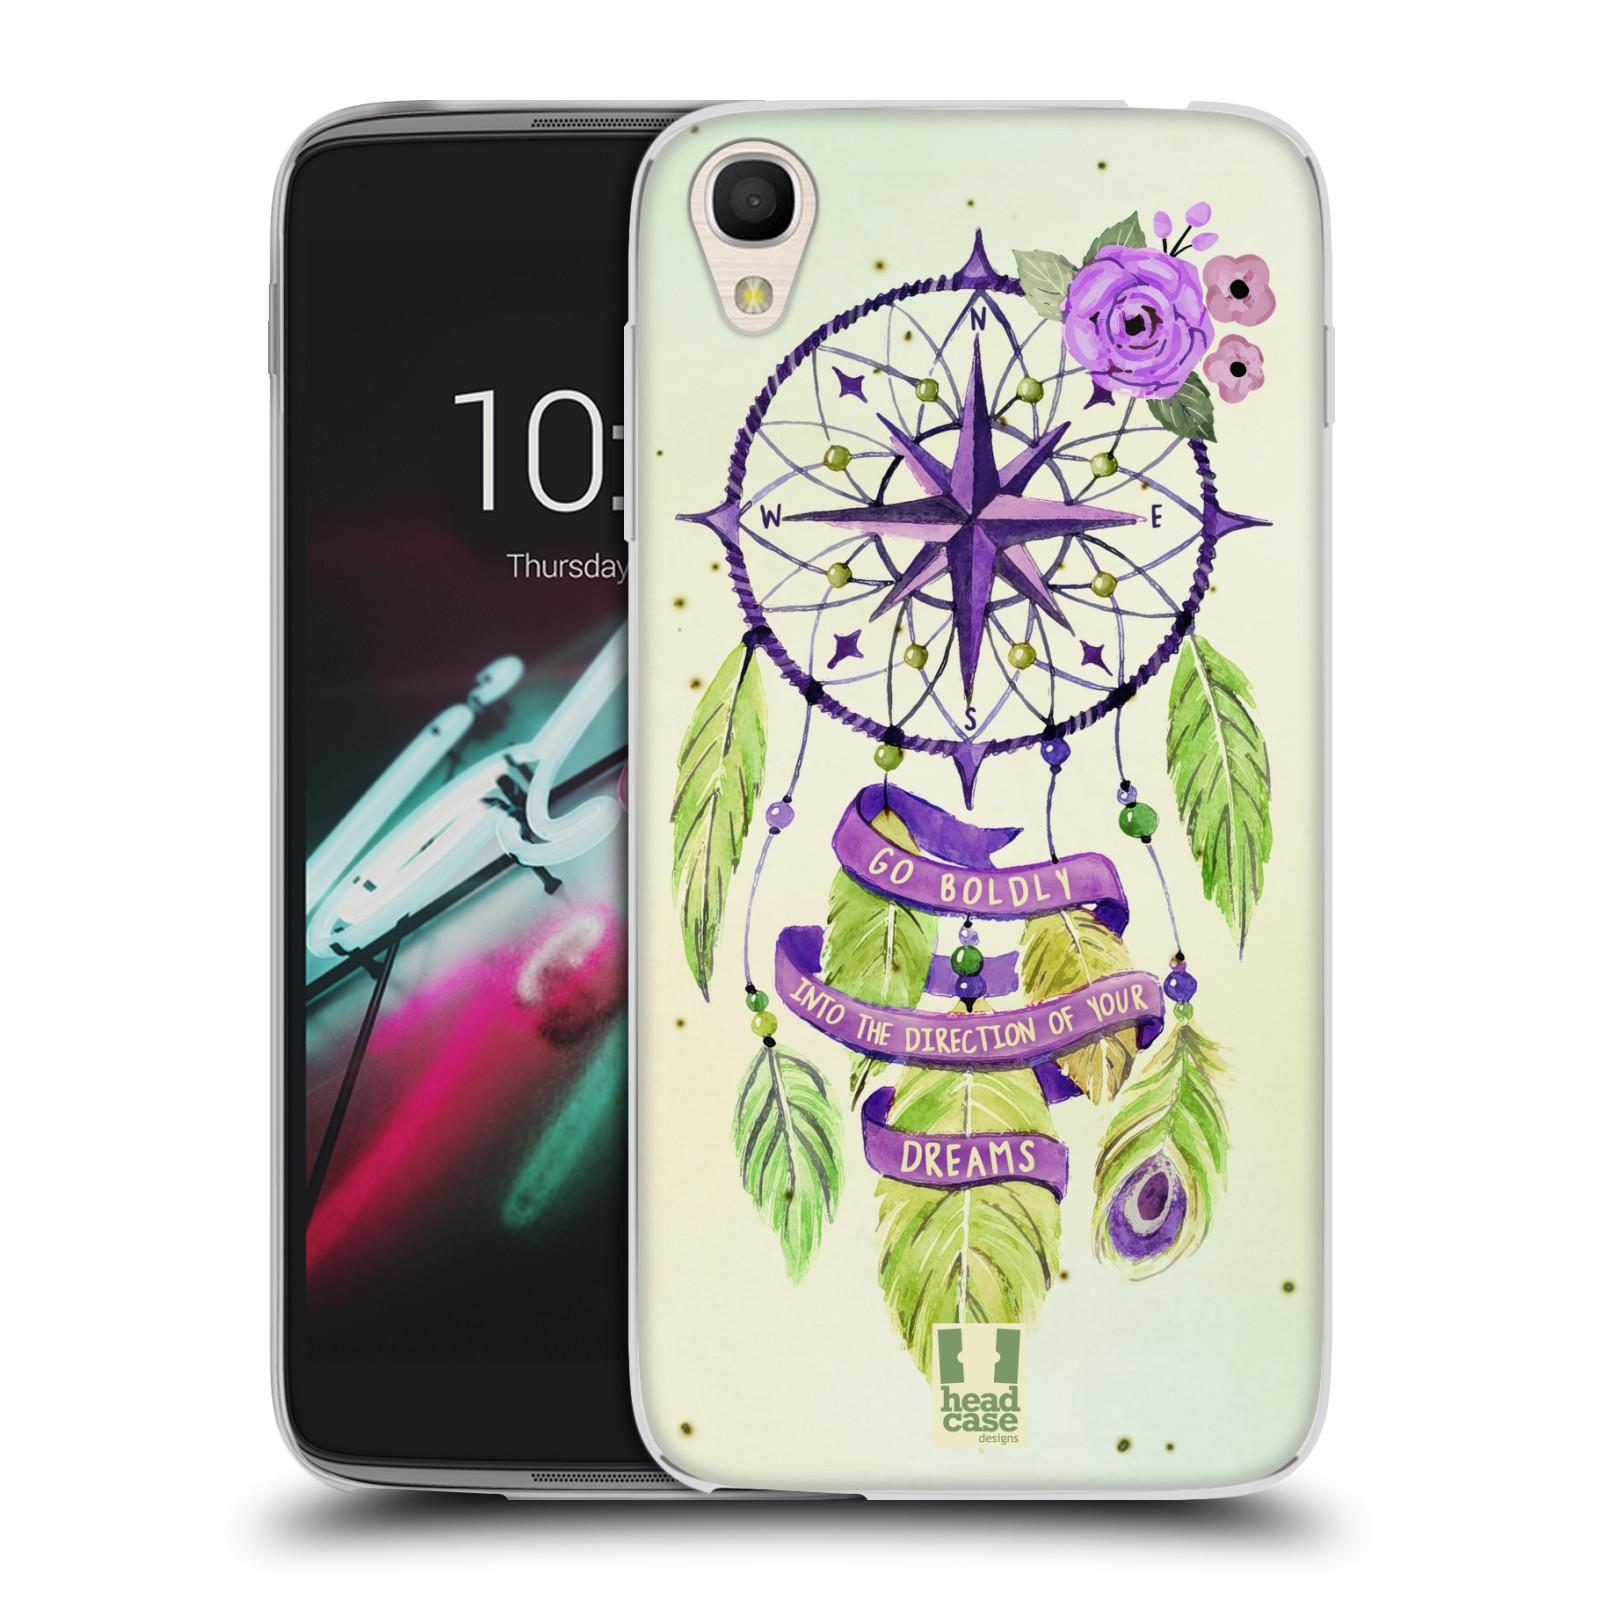 "Silikonové pouzdro na mobil Alcatel One Touch 6039Y Idol 3 HEAD CASE Lapač Assorted Compass (Silikonový kryt či obal na mobilní telefon Alcatel One Touch Idol 3 OT-6039Y s 4,7"" displejem)"